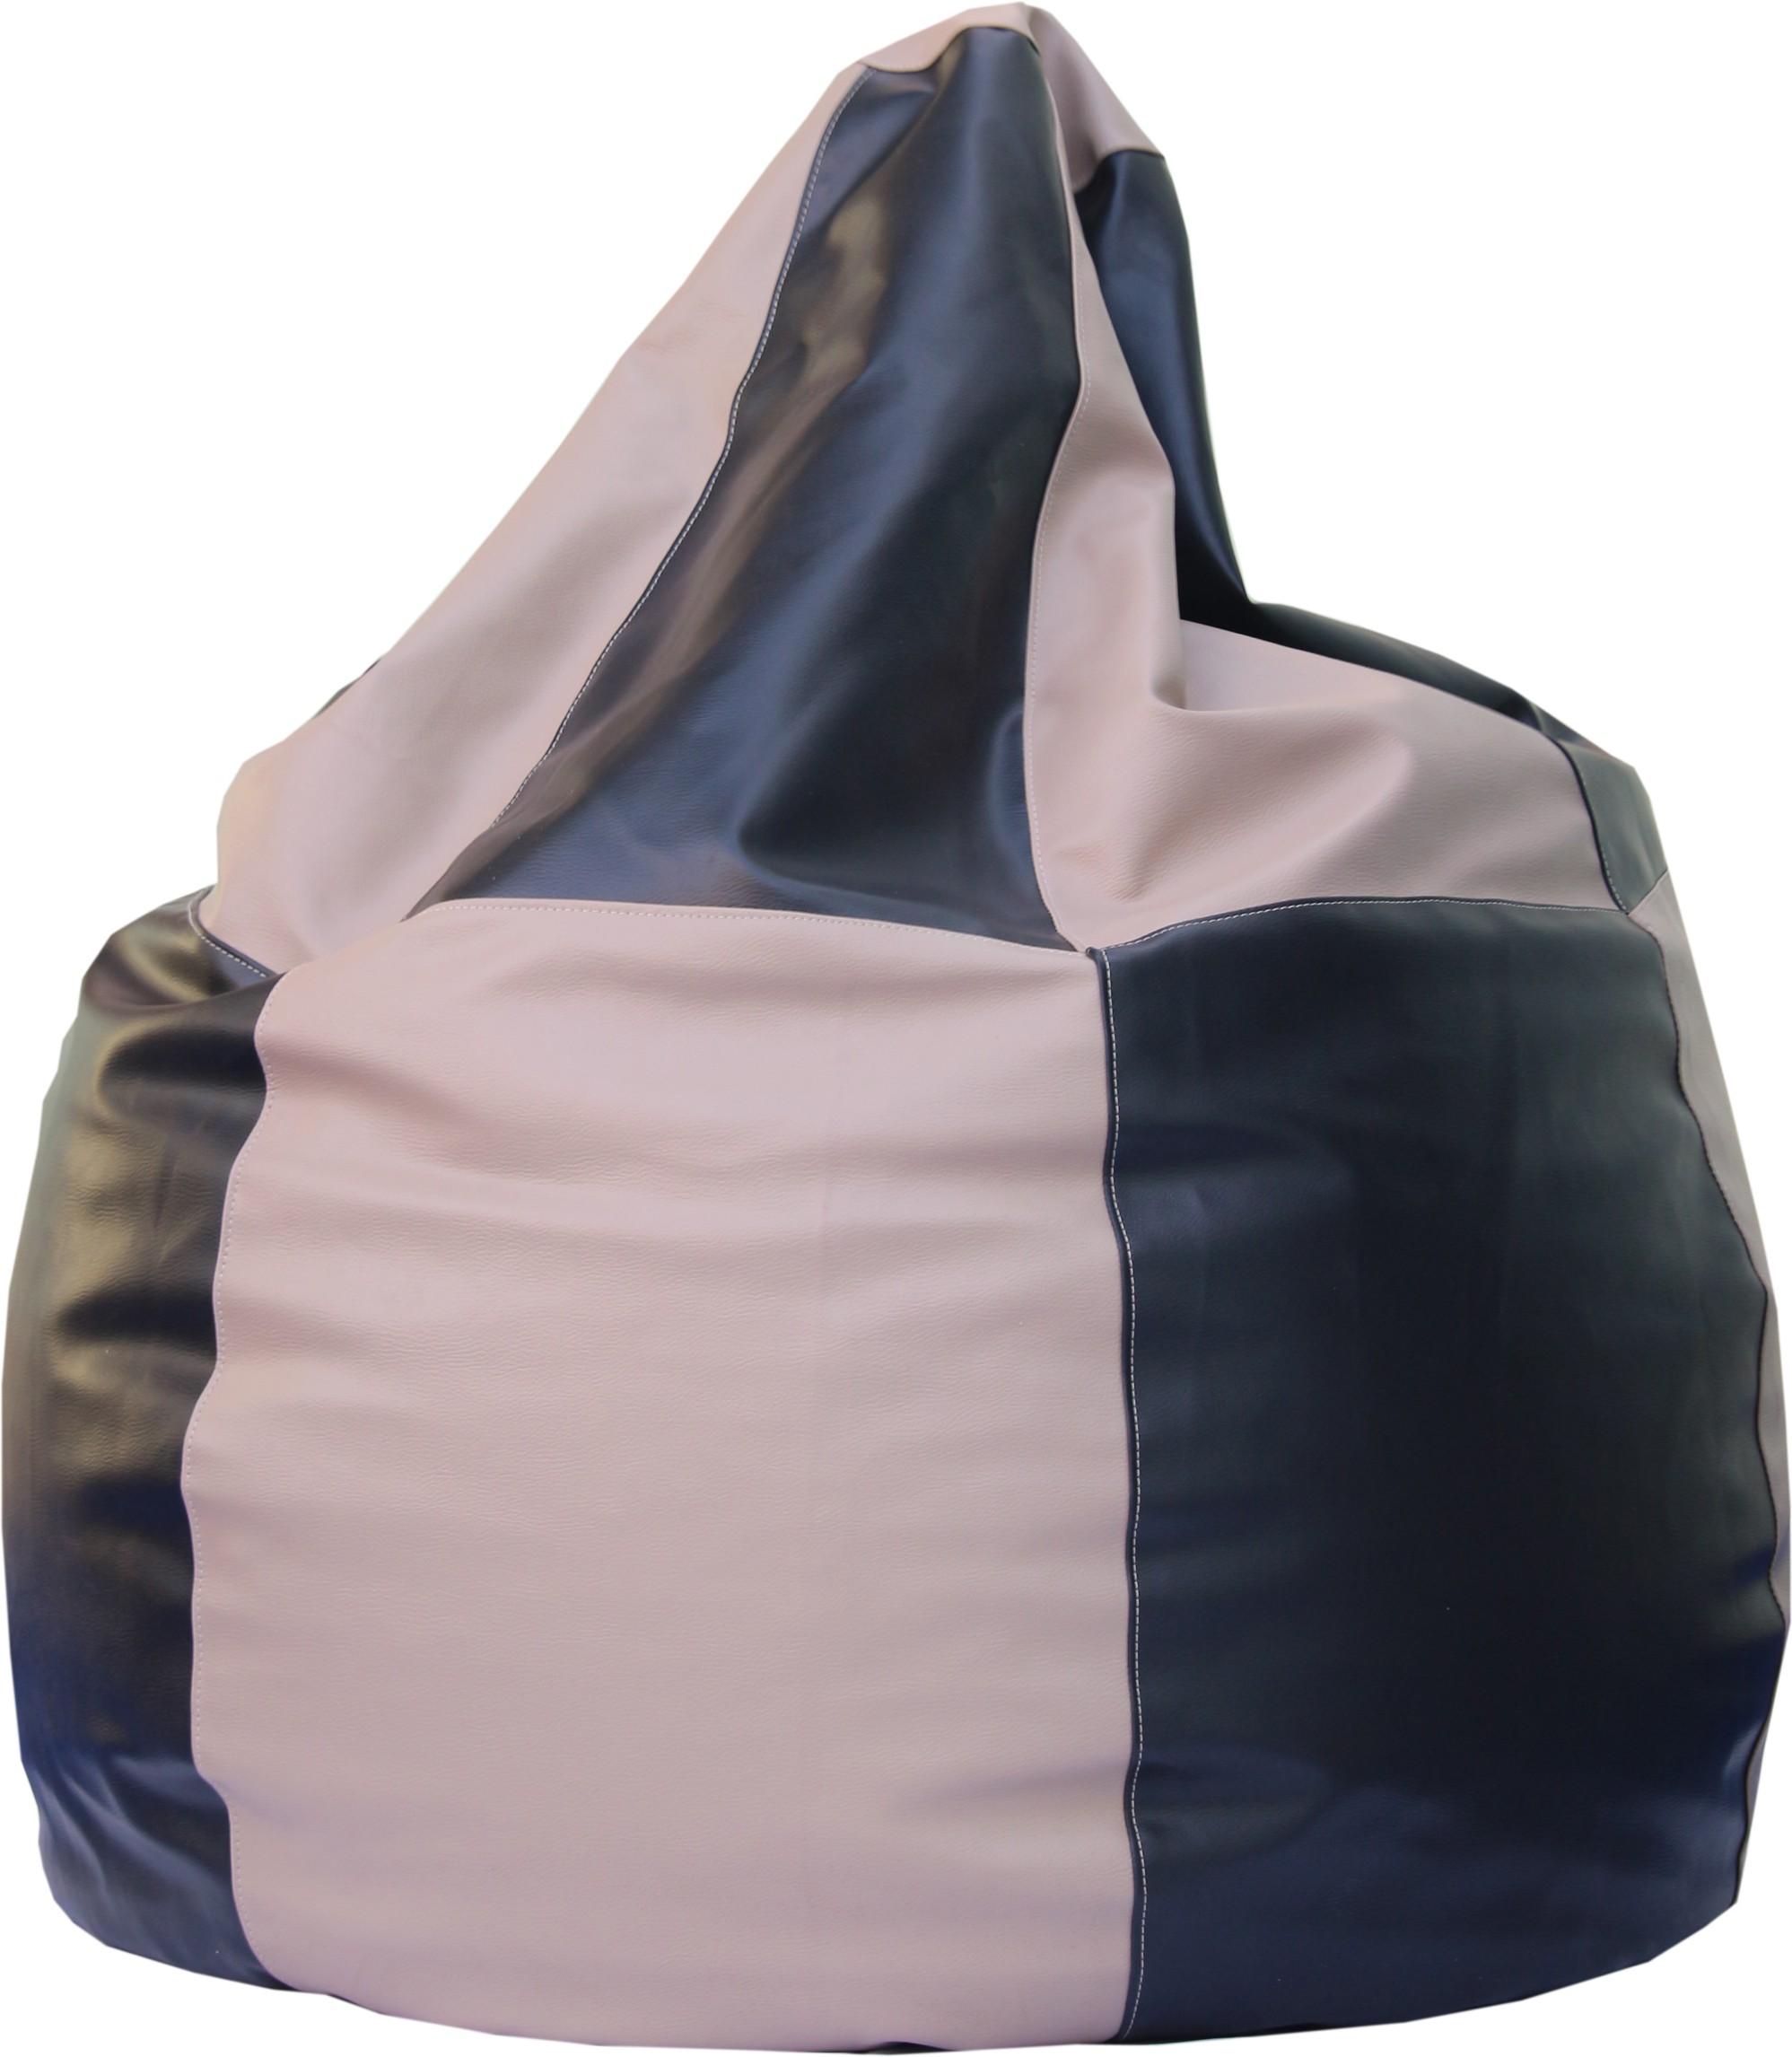 View Beanskart XXL Bean Bag  With Bean Filling(Multicolor) Furniture (Beanskart)